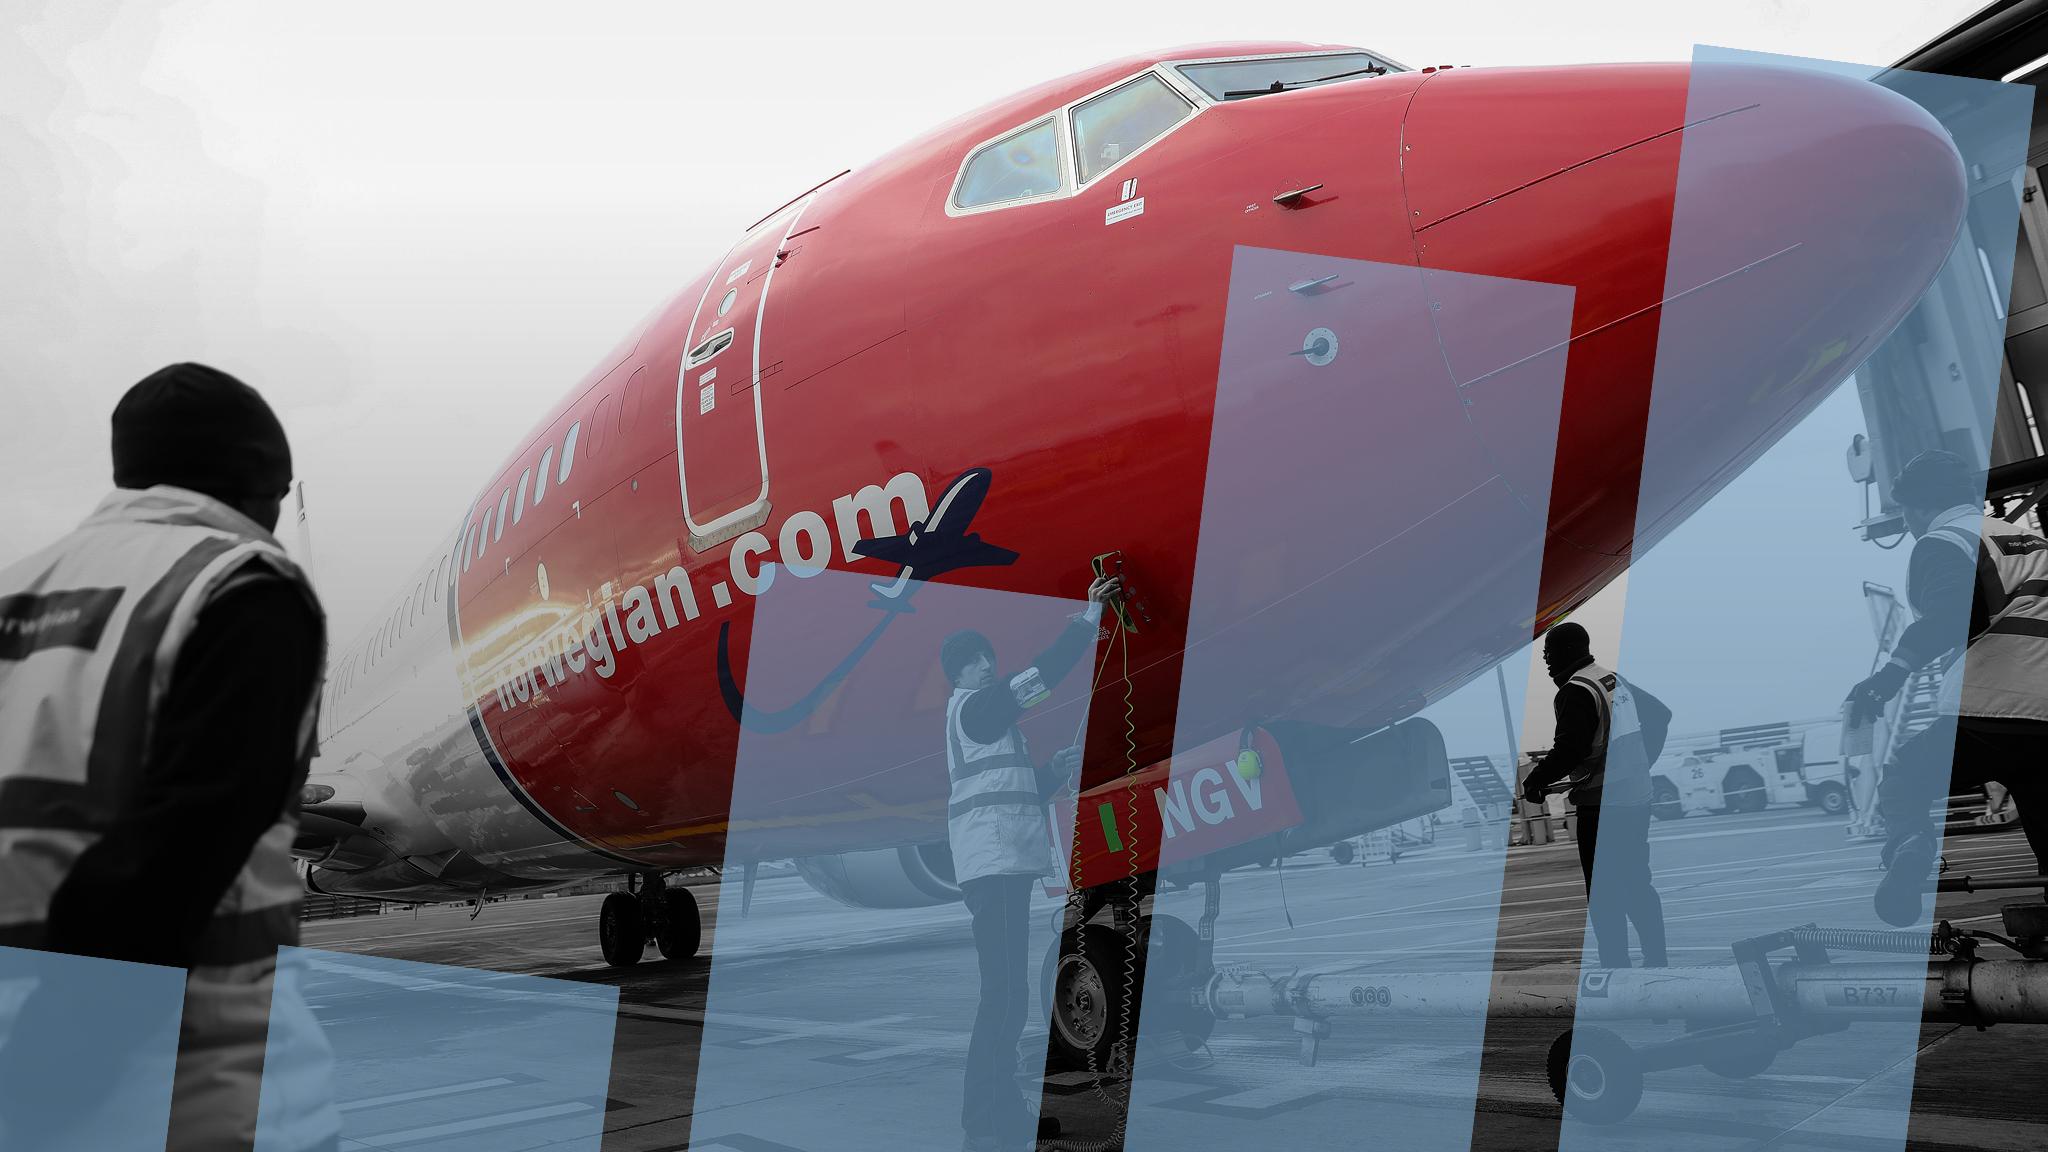 Investors fret over Norwegian Air's rapid growth